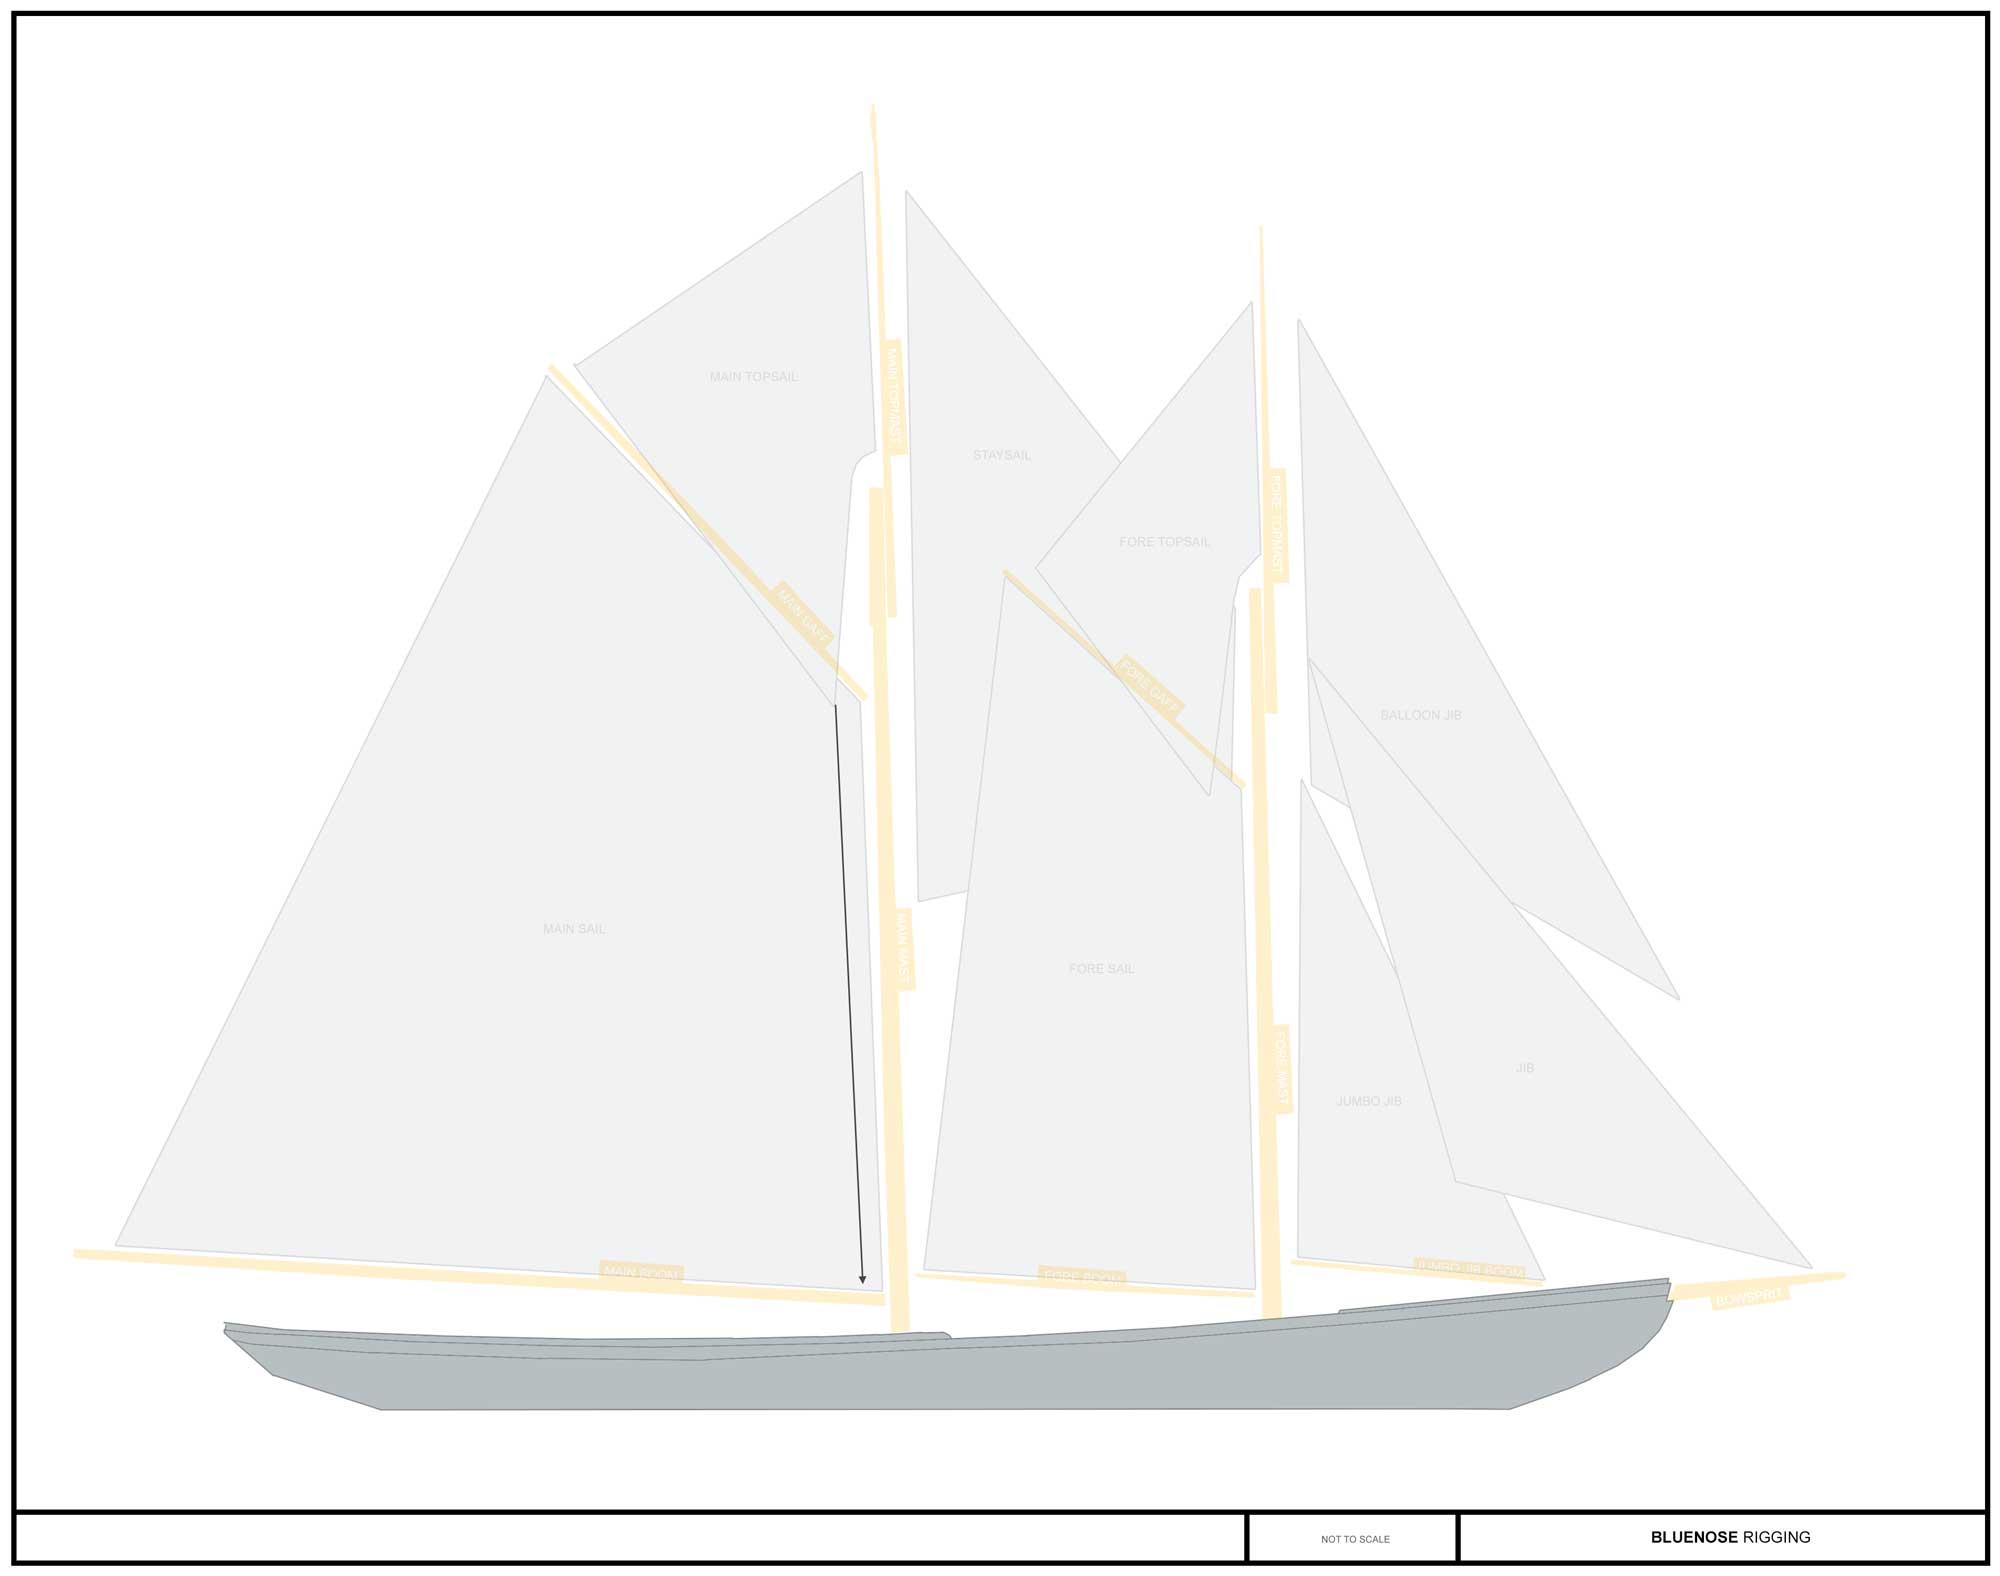 maintopsail-tack